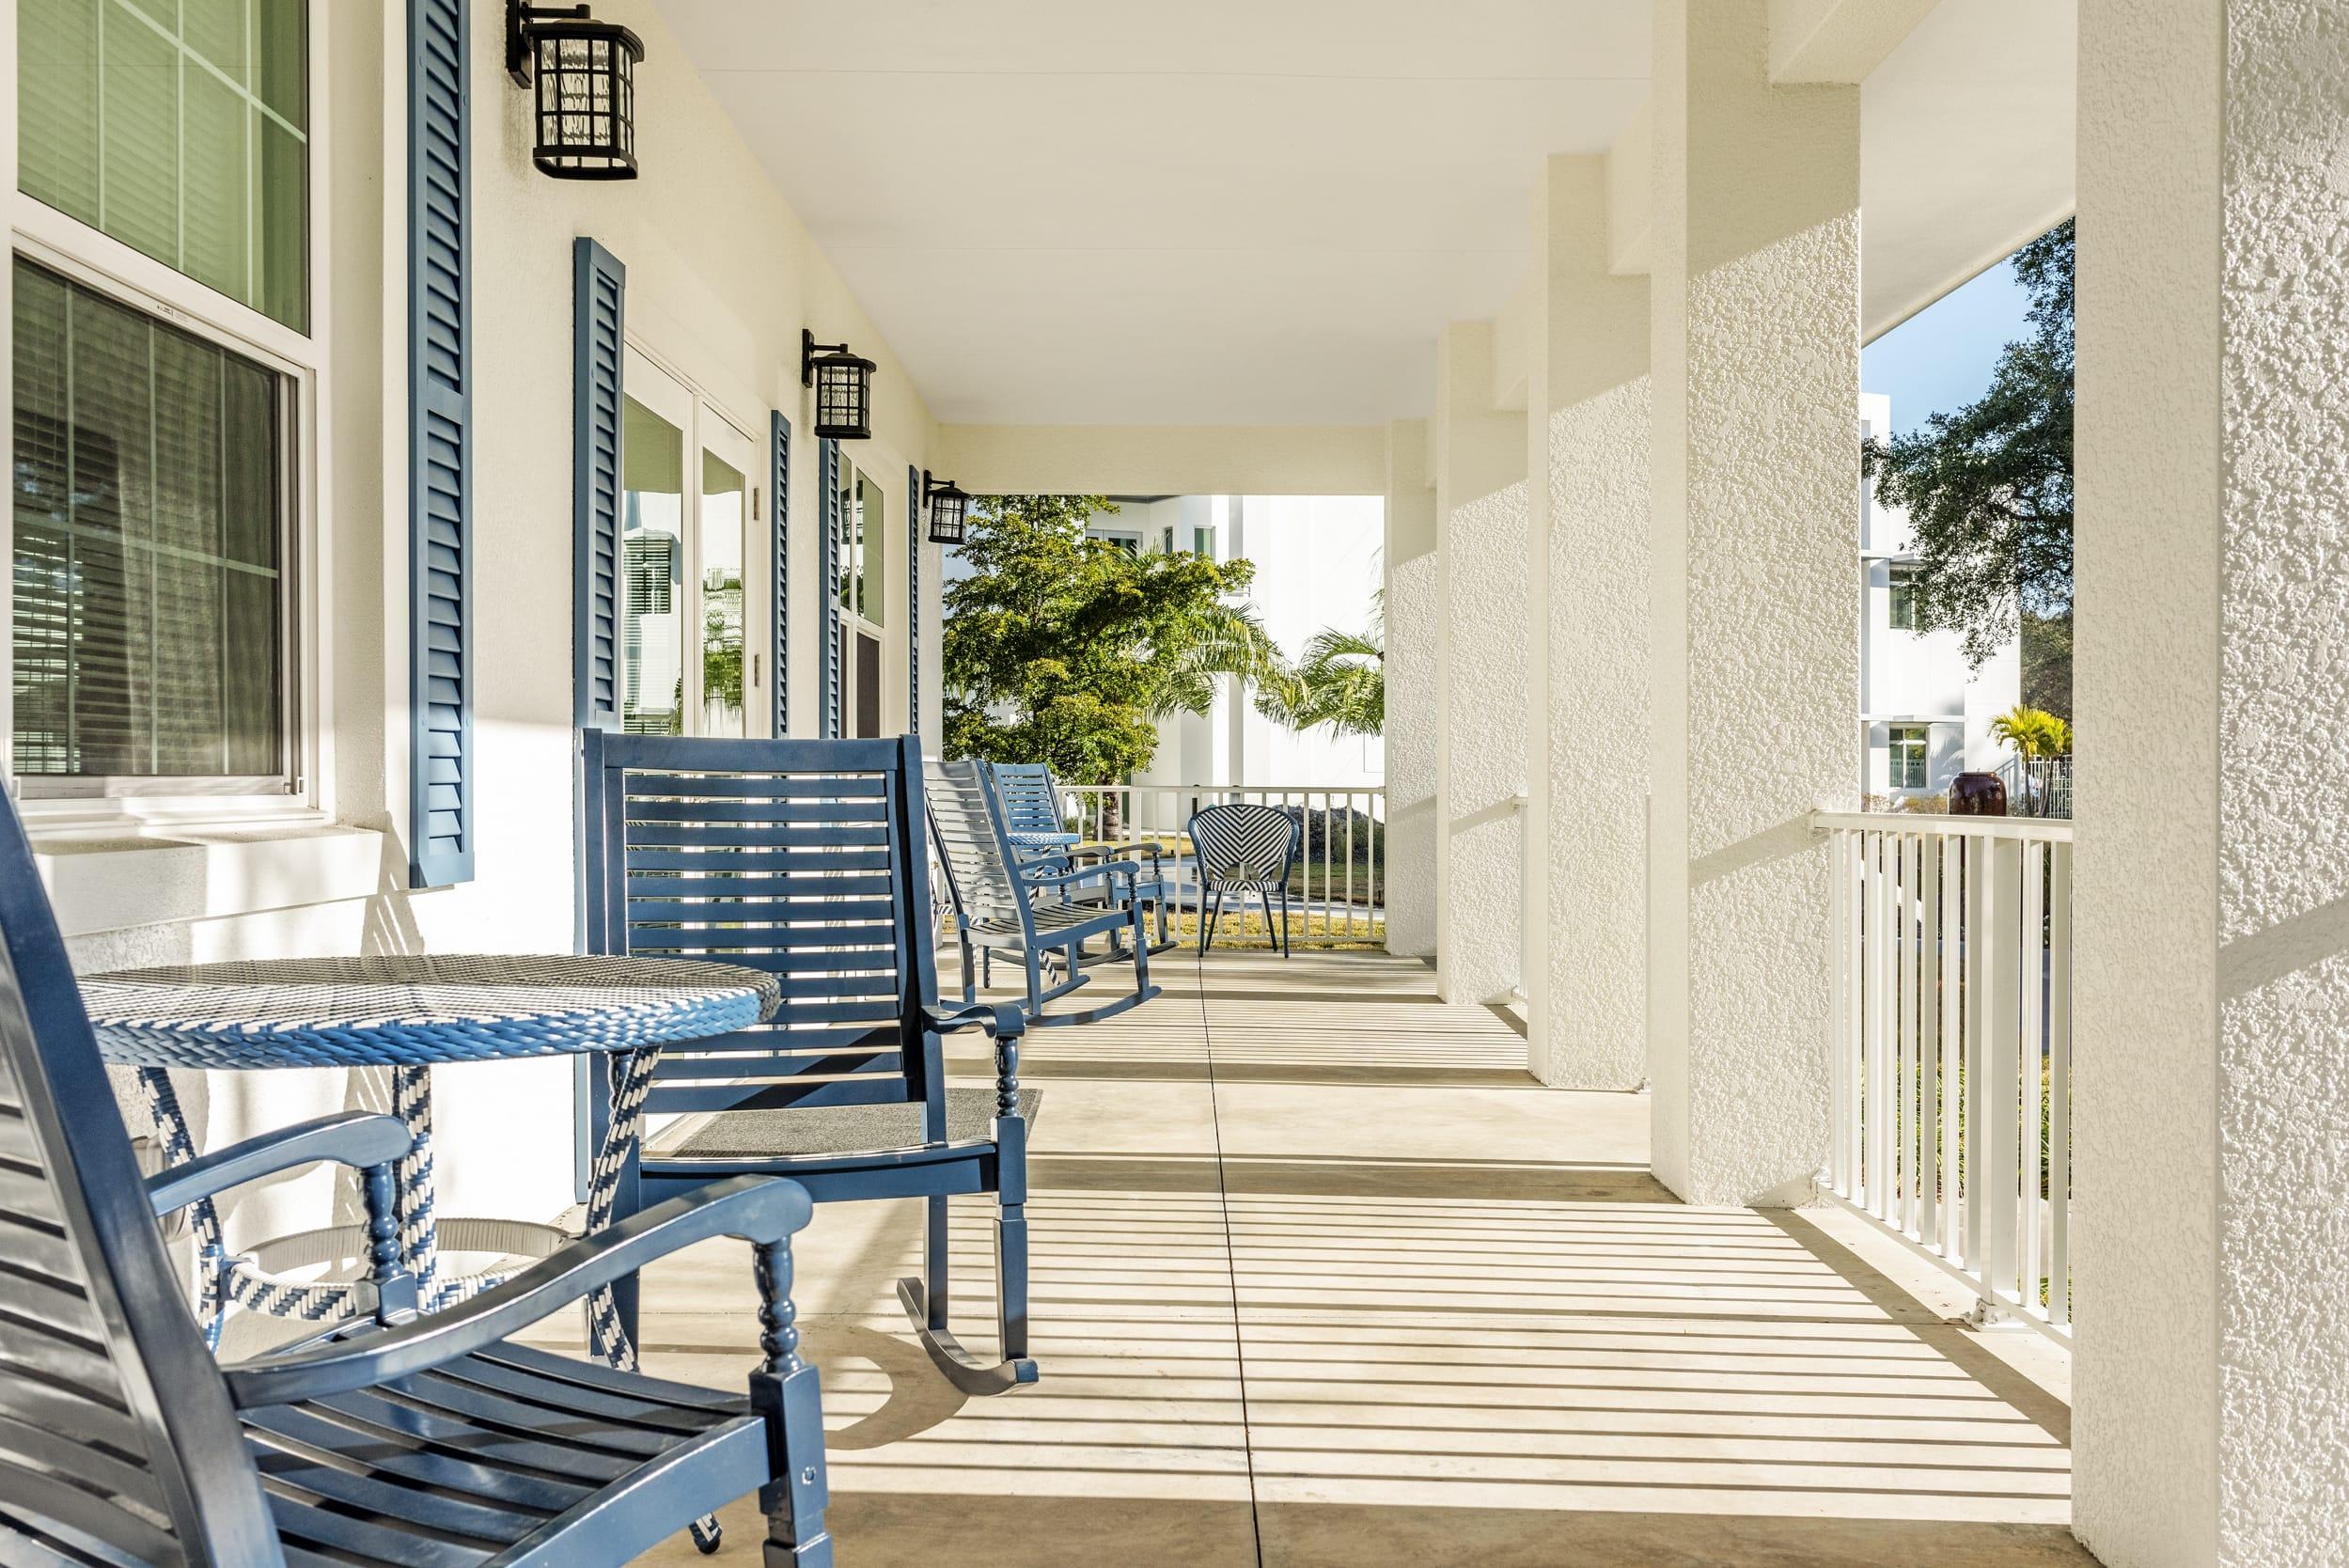 Blue Porch Chairs Shaddow Of Railings